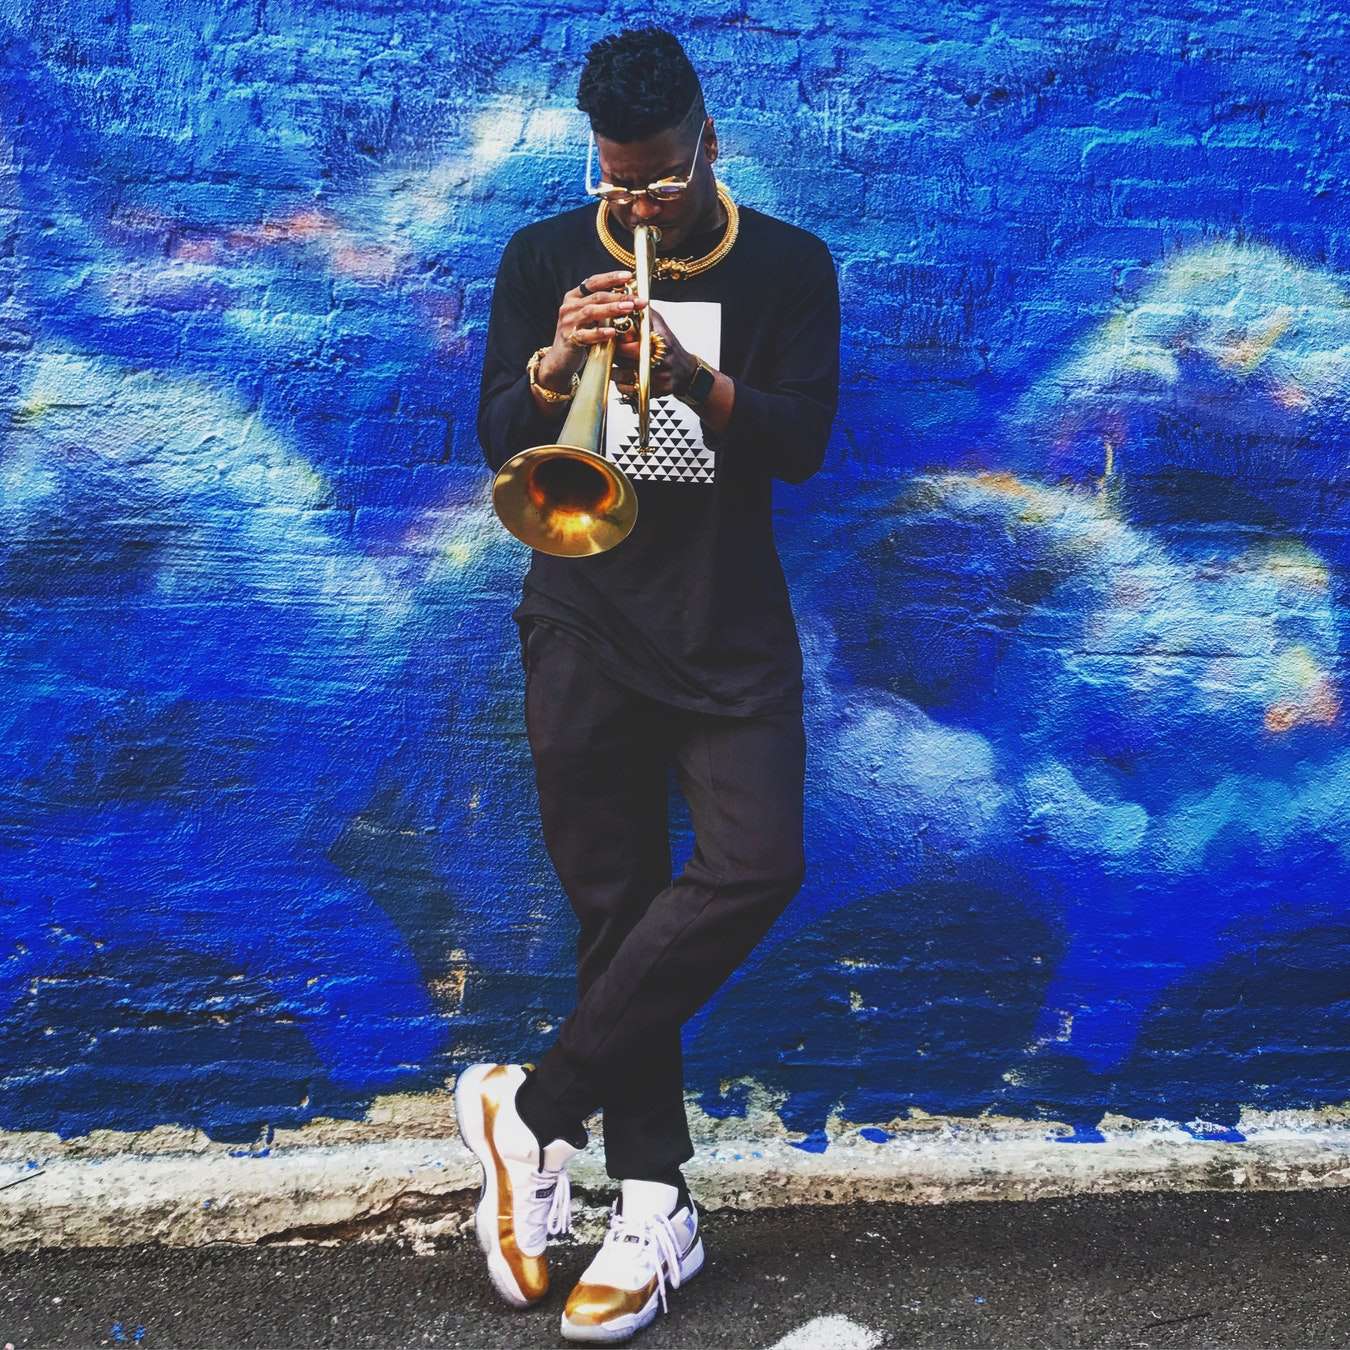 Christian Scott ATunde Adjuah (Harlem,NY/2018)